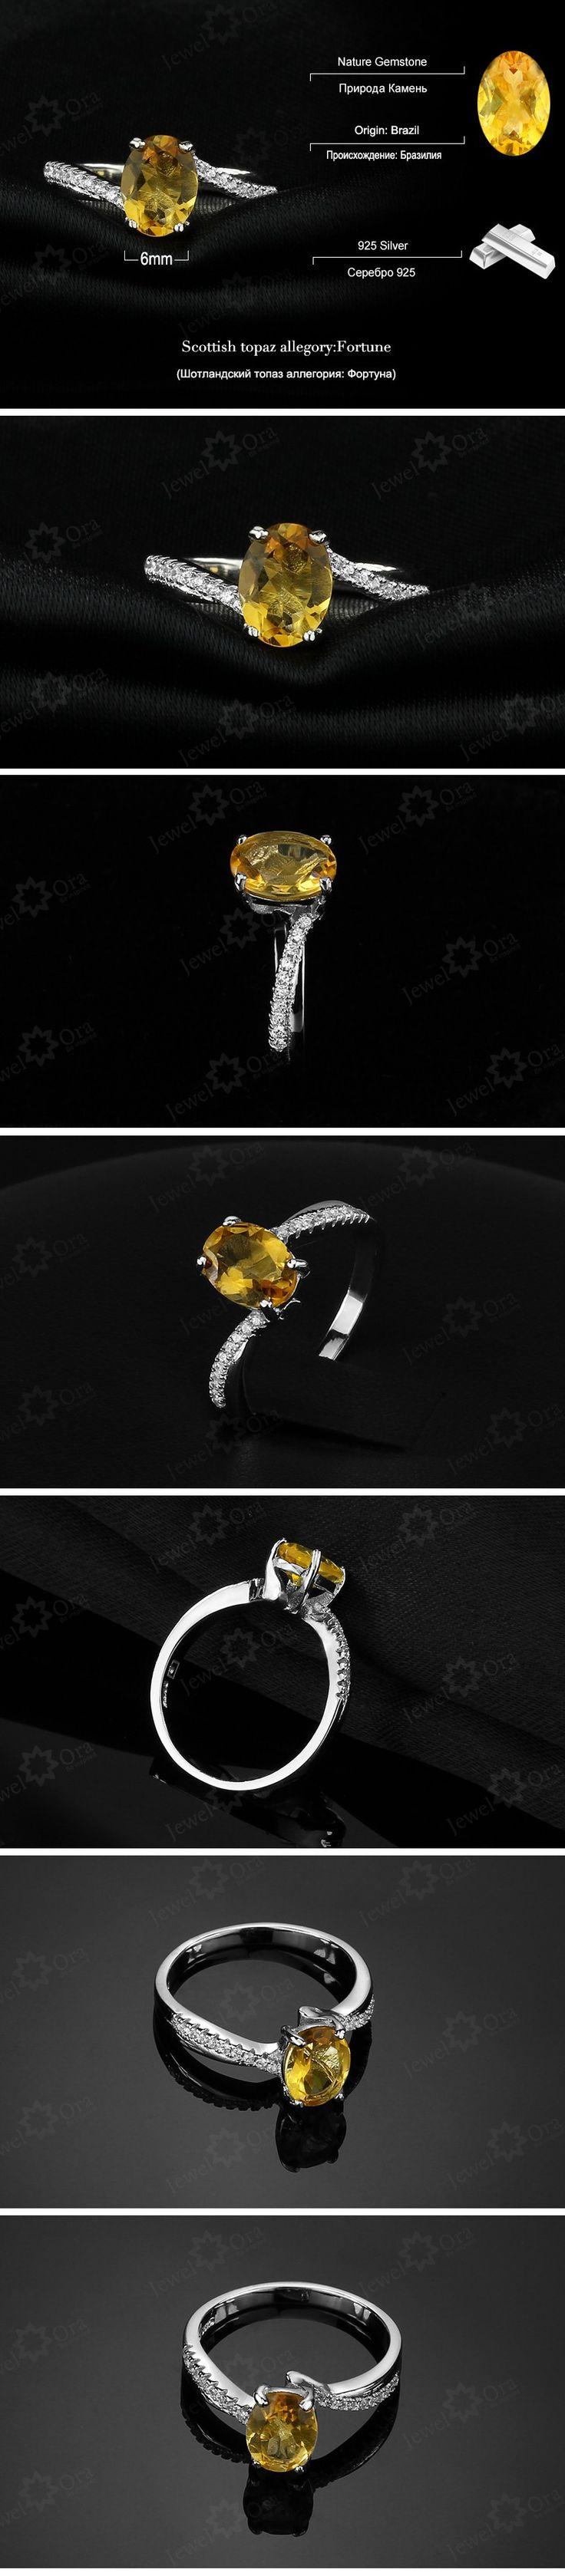 Aliexpress.com : Buy Genuíno 925 anéis de prata para as mulheres do partido Fine Jewelry Amarelo Citrino Natural Ring ( JewelOra RI101282 ) from Reliable anel de couro suppliers on JewelOra